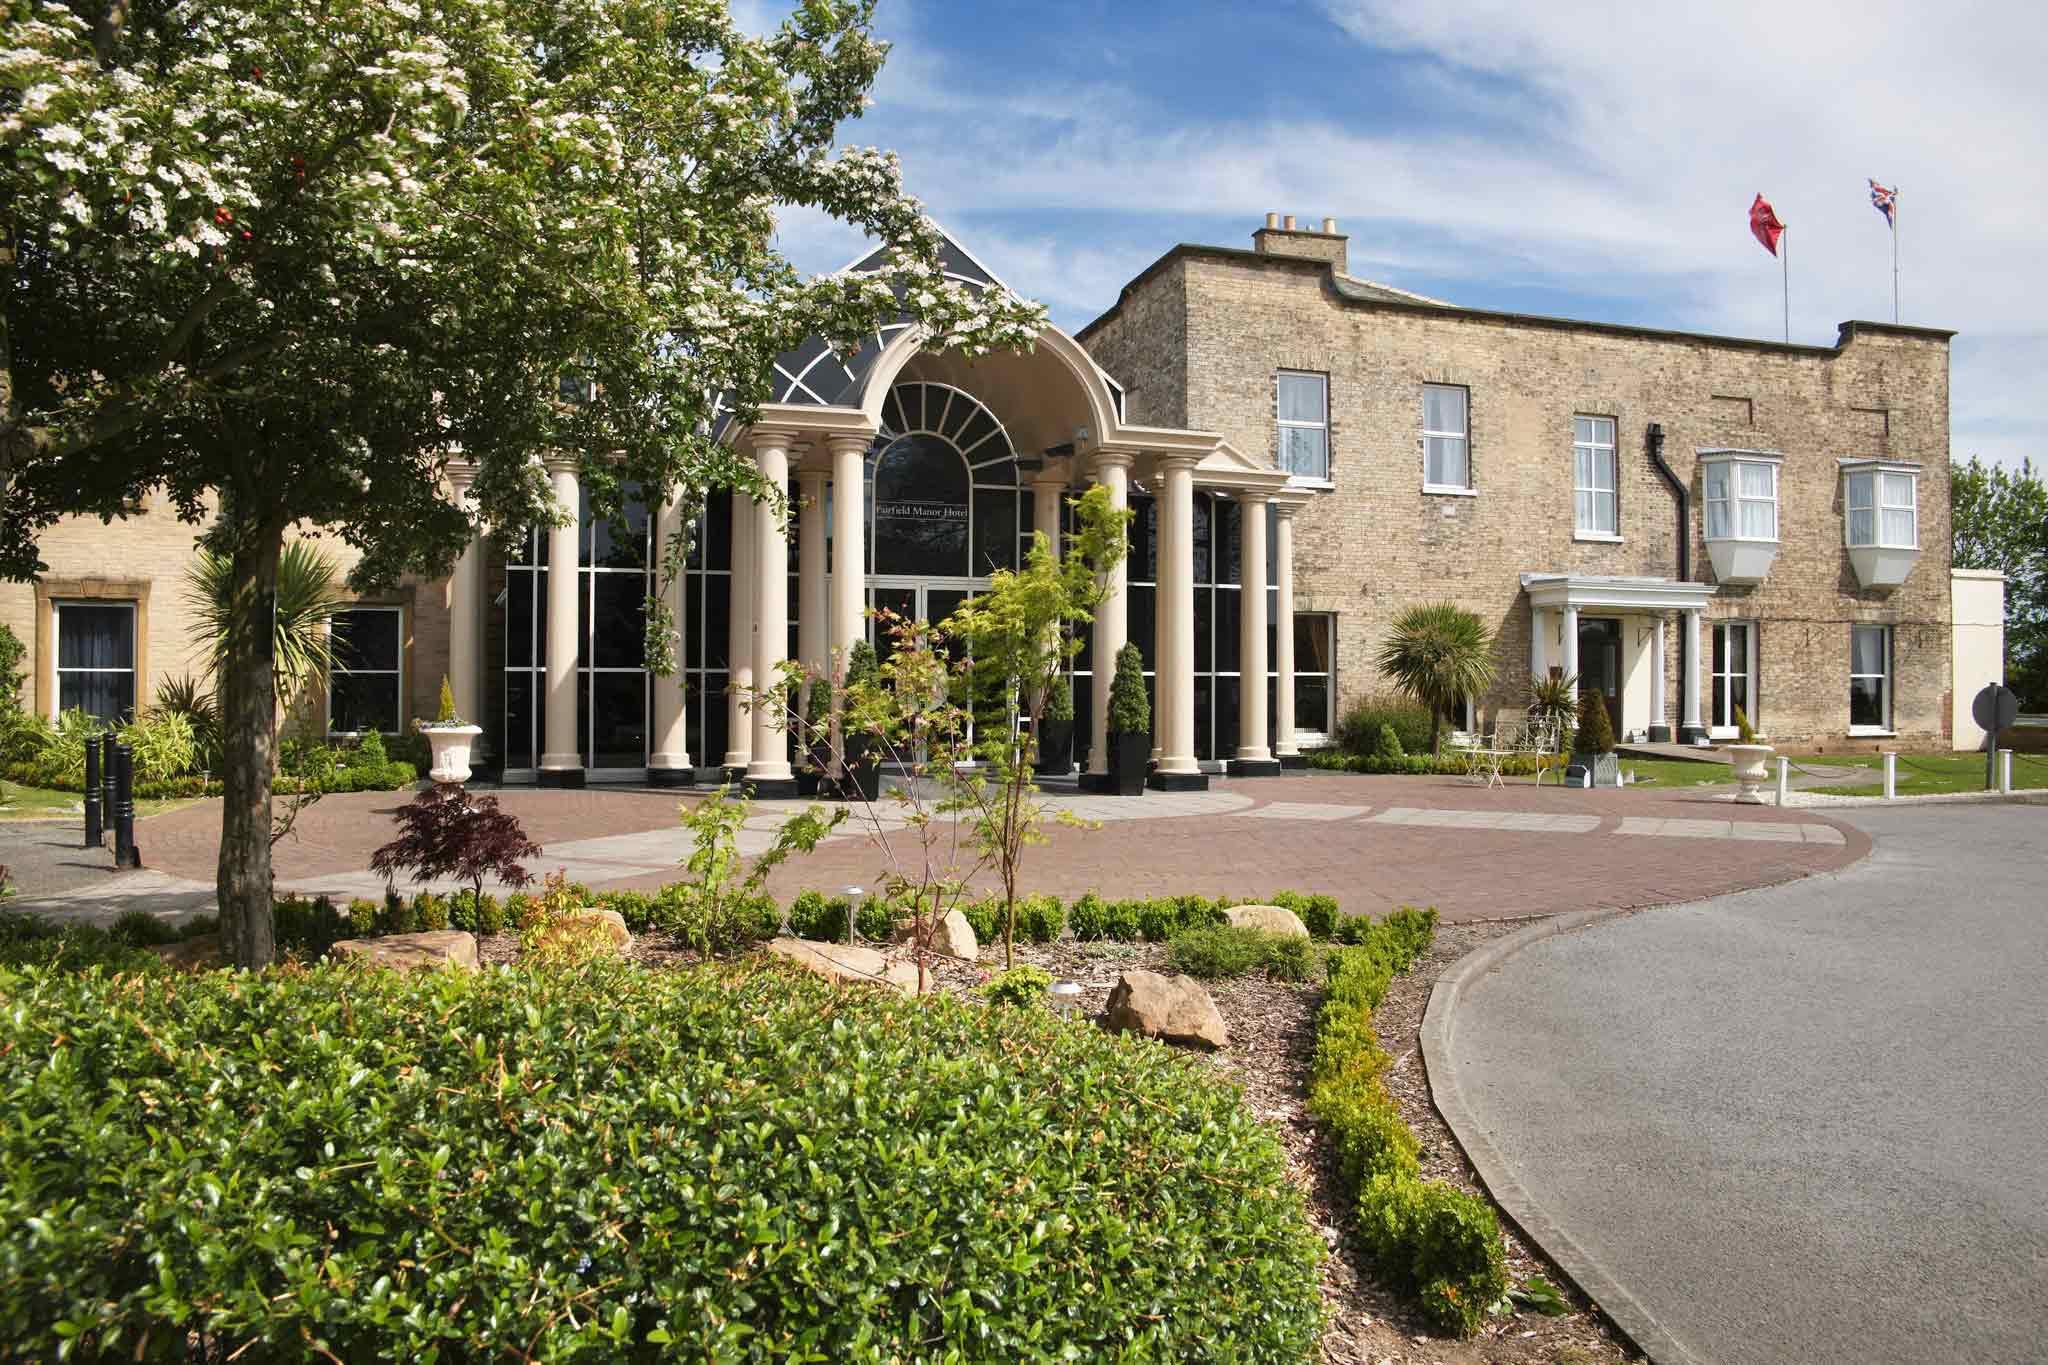 Family Mercure York Fairfield Manor Hotel